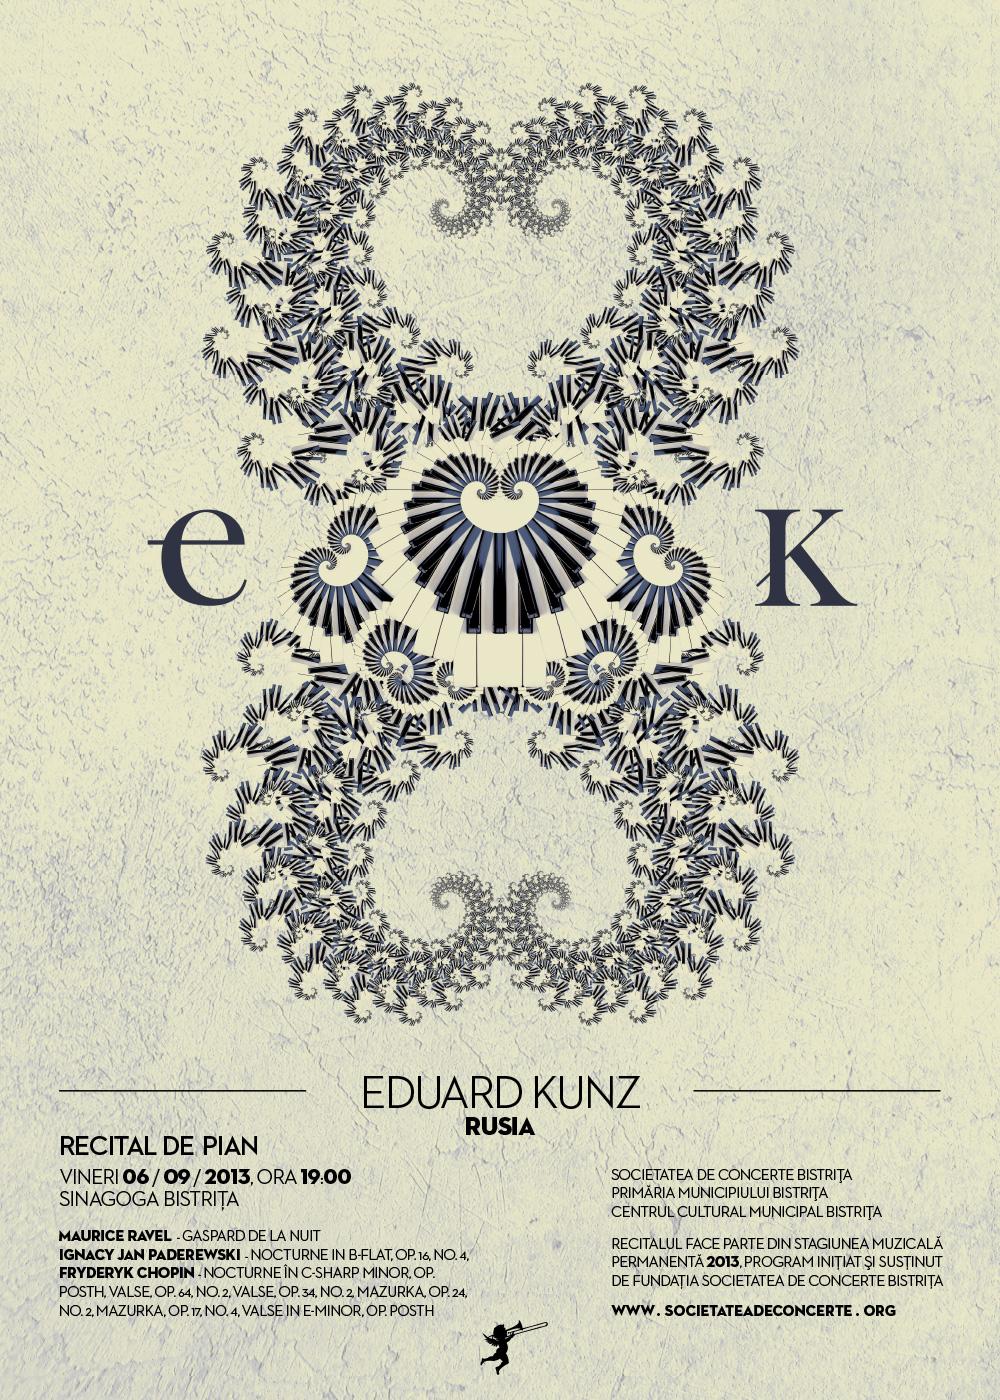 Poster recital de pian Eduard Kunz Bistrita 2013